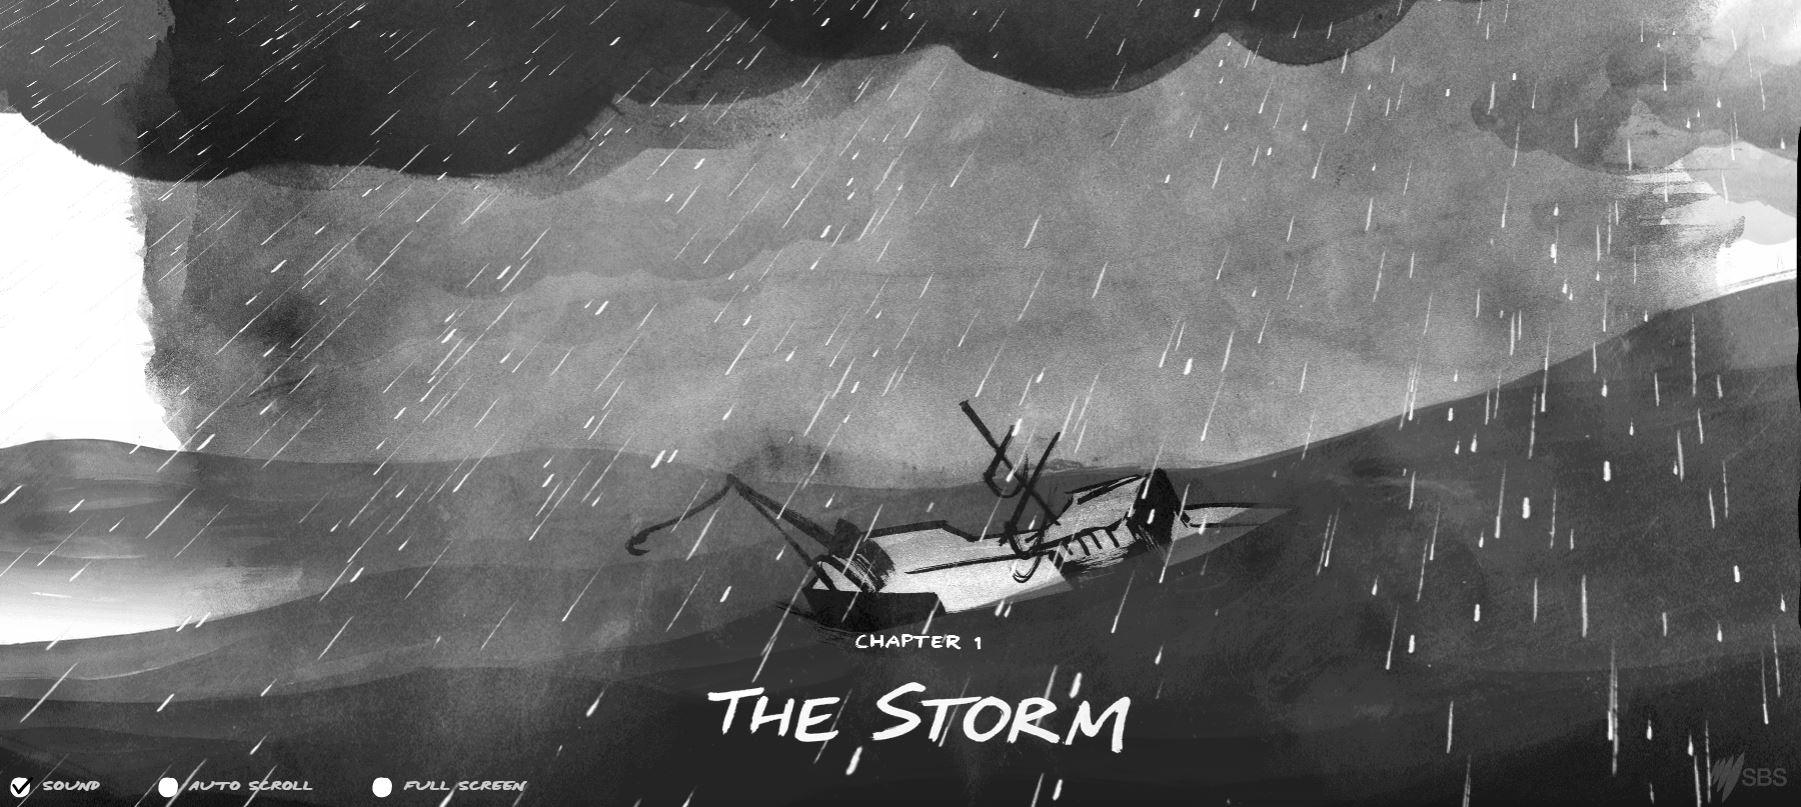 Корабль попал в шторм